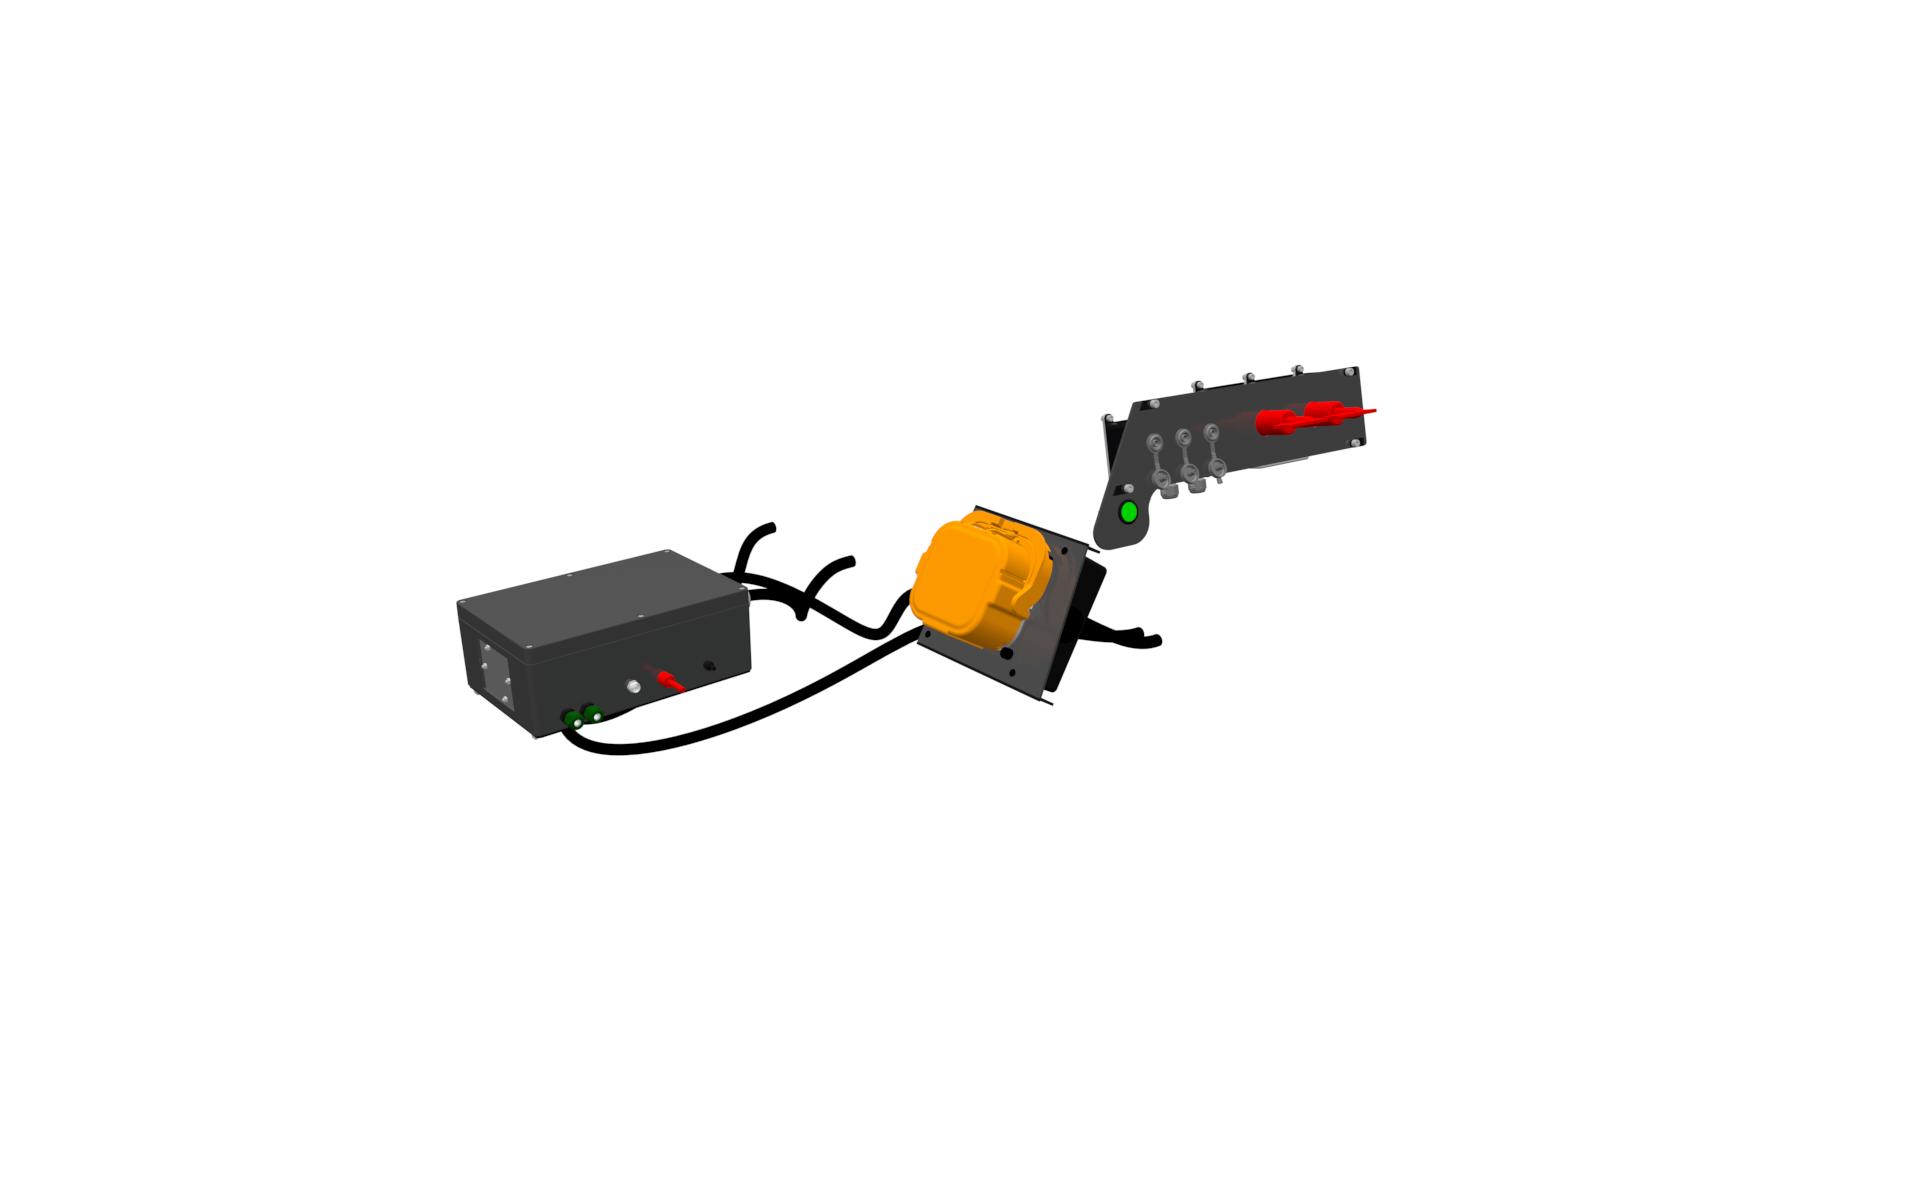 modul_rendering_electronics